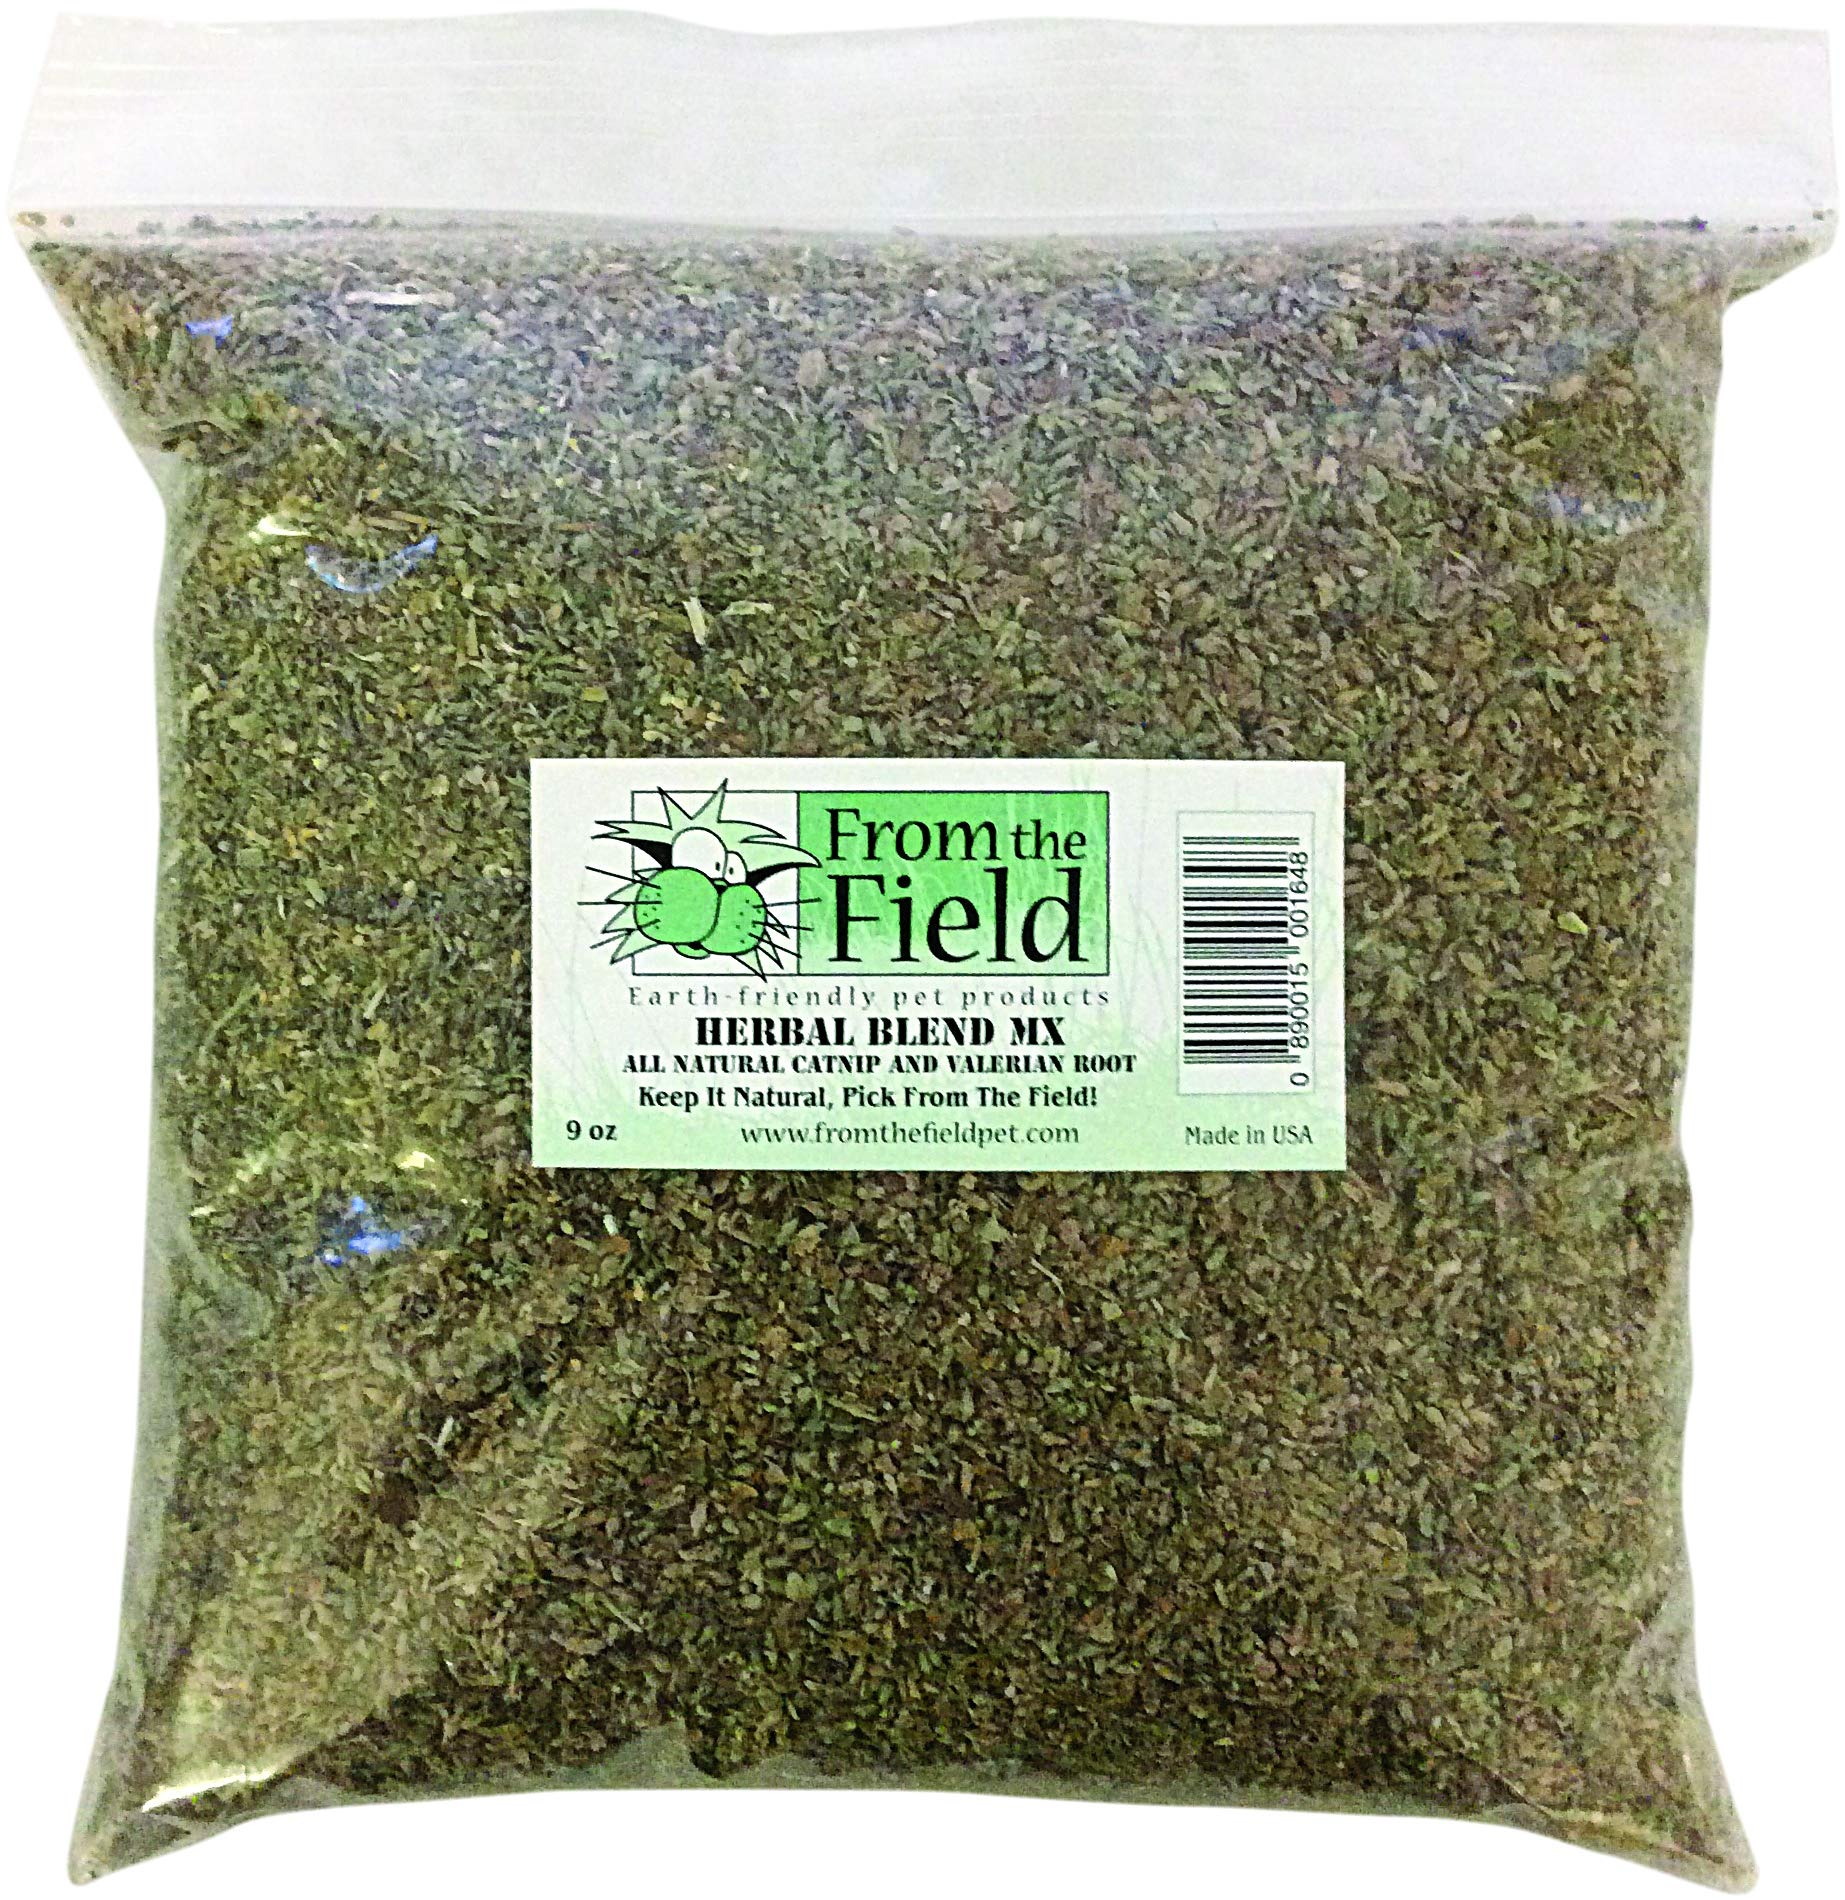 From The Field Herbal Blend MX Catnip & Valerian Root Bag 9 oz Bag